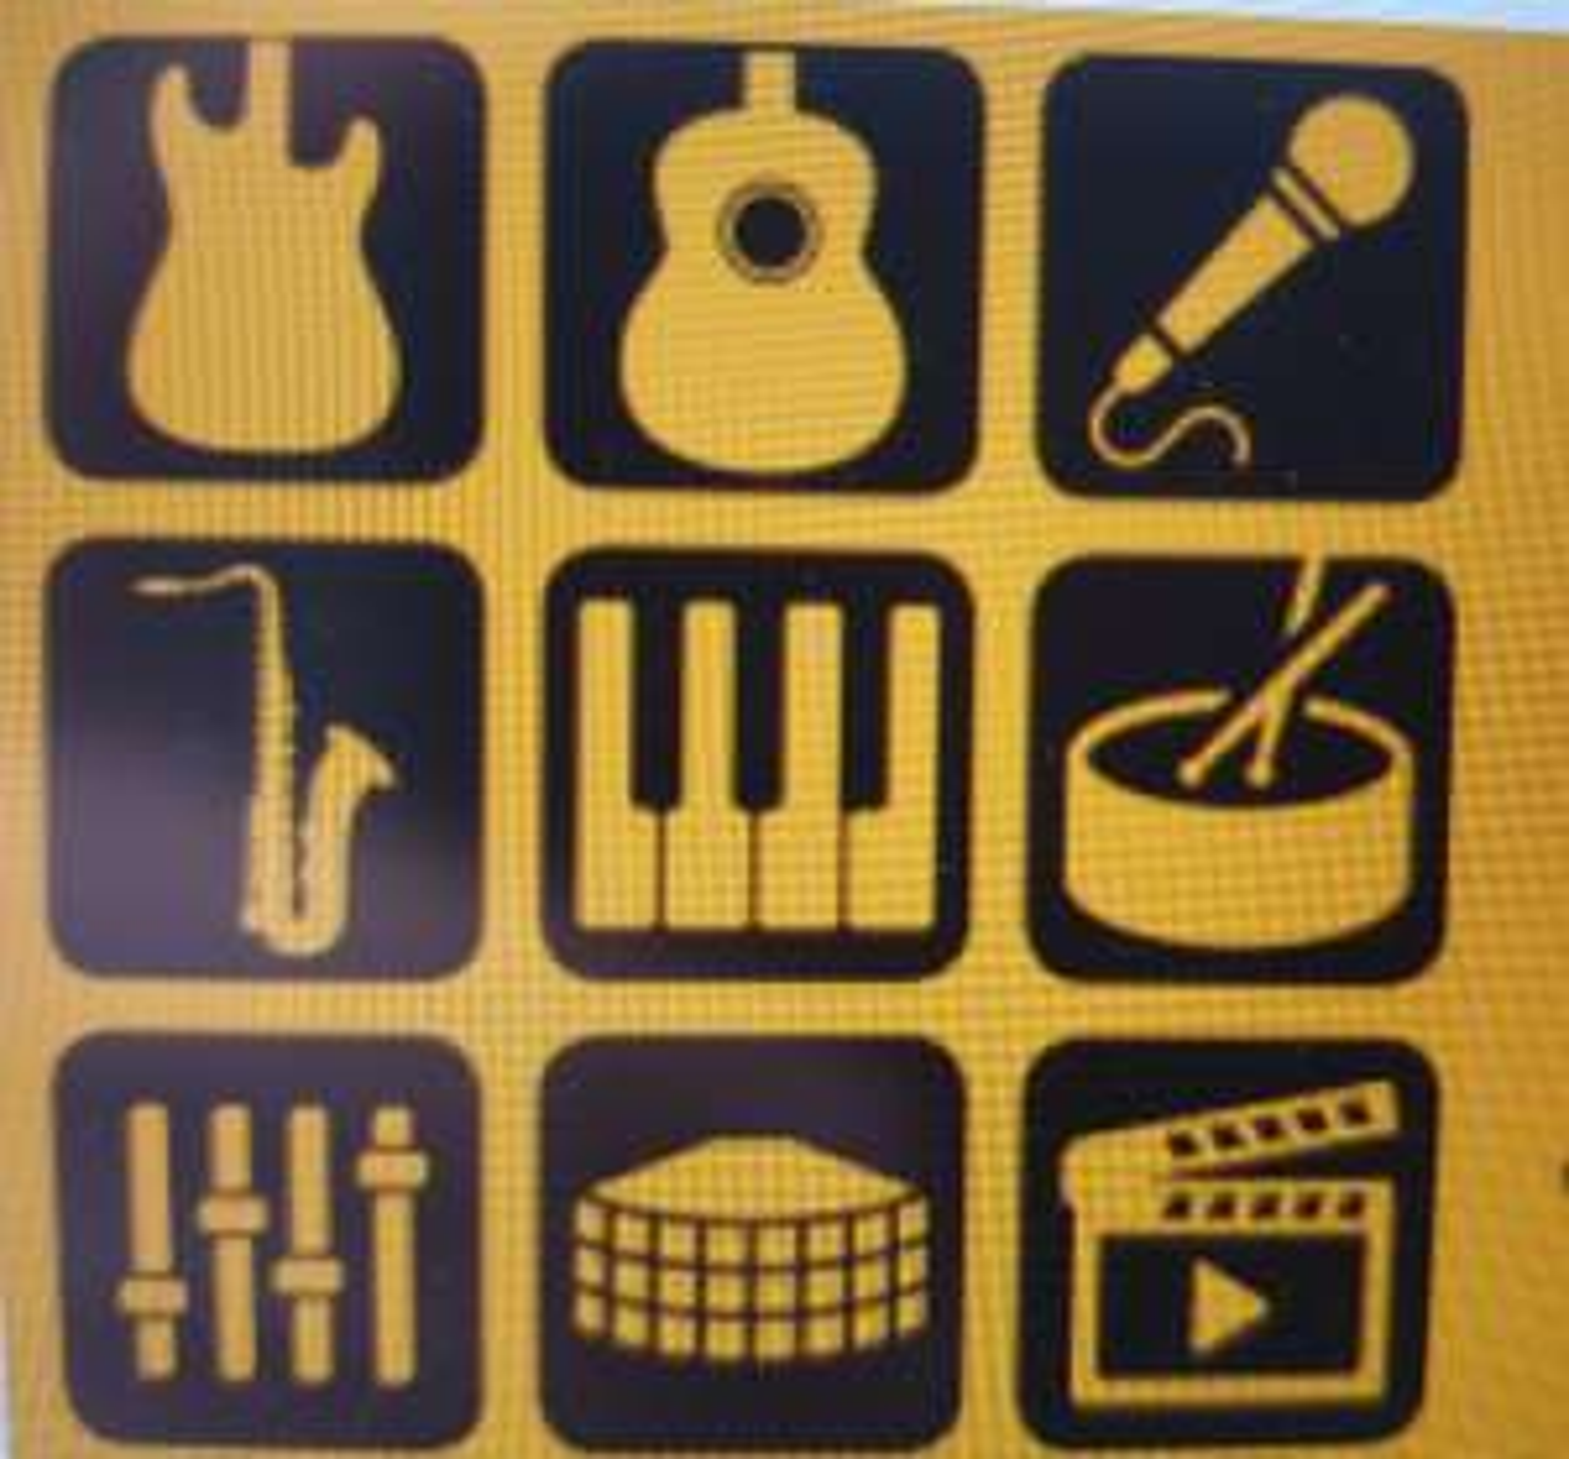 [Free] [PPV Medien] Musiker-Magazine gratis downloaden, Drumheads, Guitar, Keys, soundcheck, tastenwelt etc.